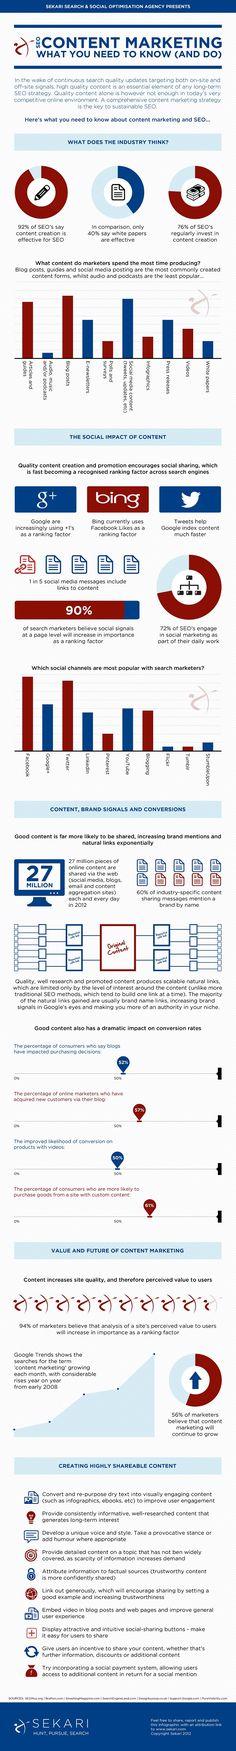 content marketing #SEO strategy Infographic # www.seobats.com